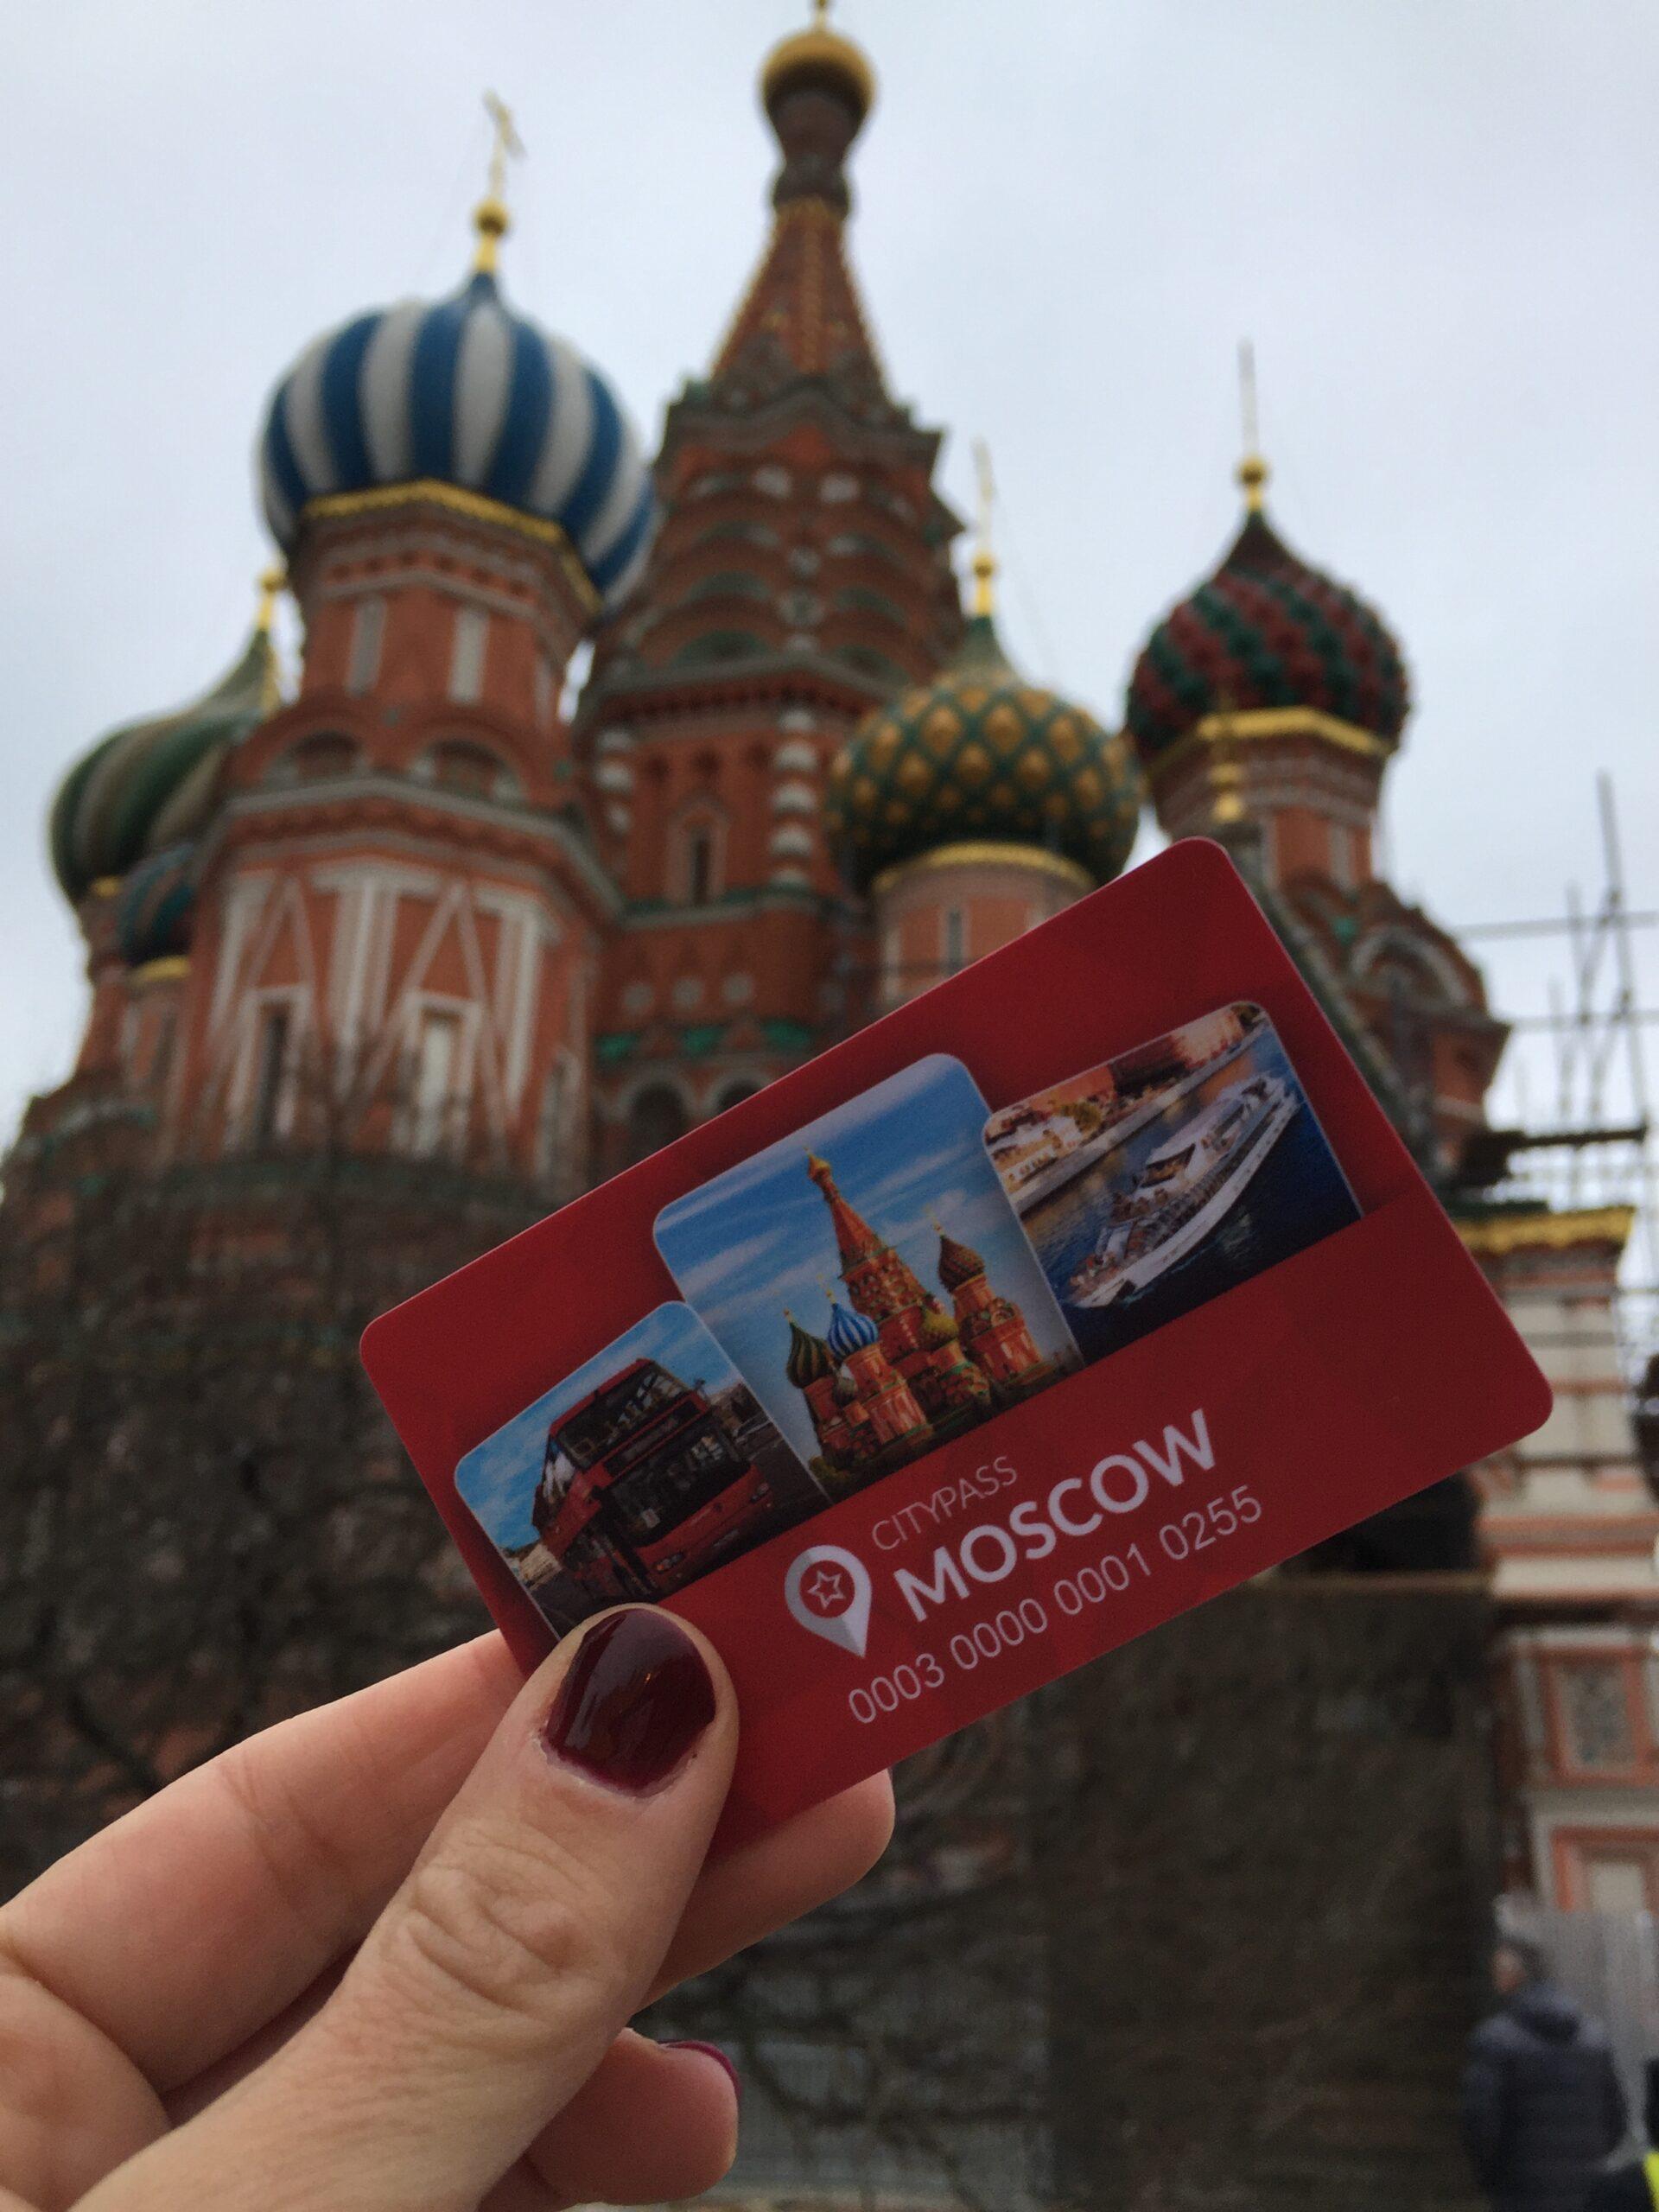 Risparmiare a Mosca grazie alla Moscow City Pass